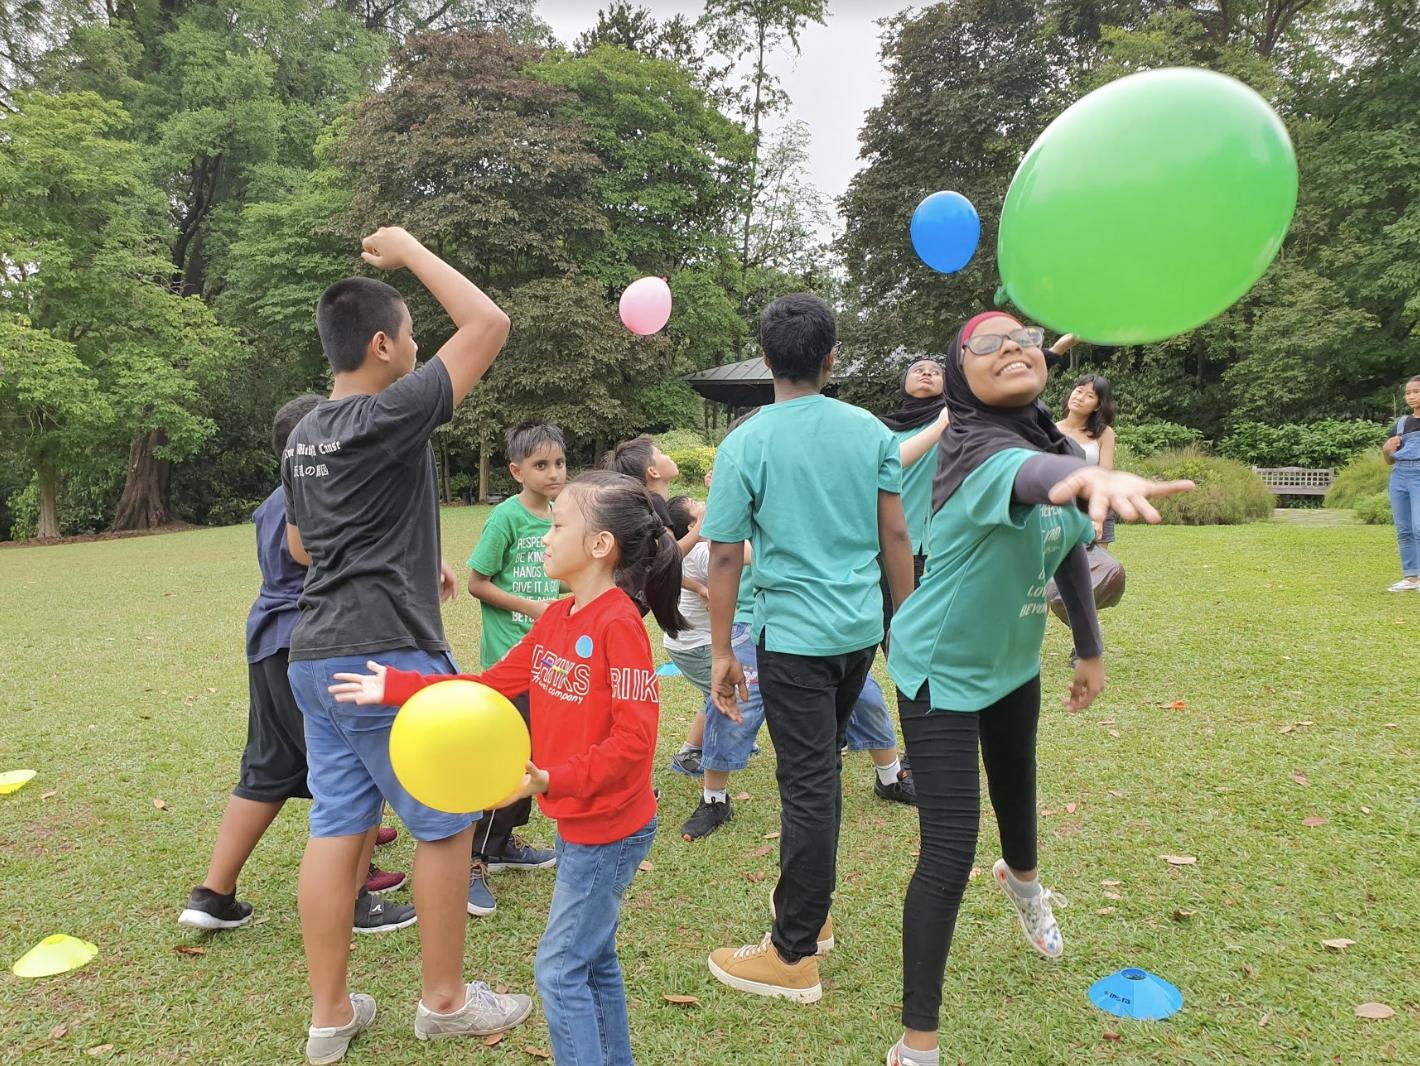 Children's Charity in Singapore